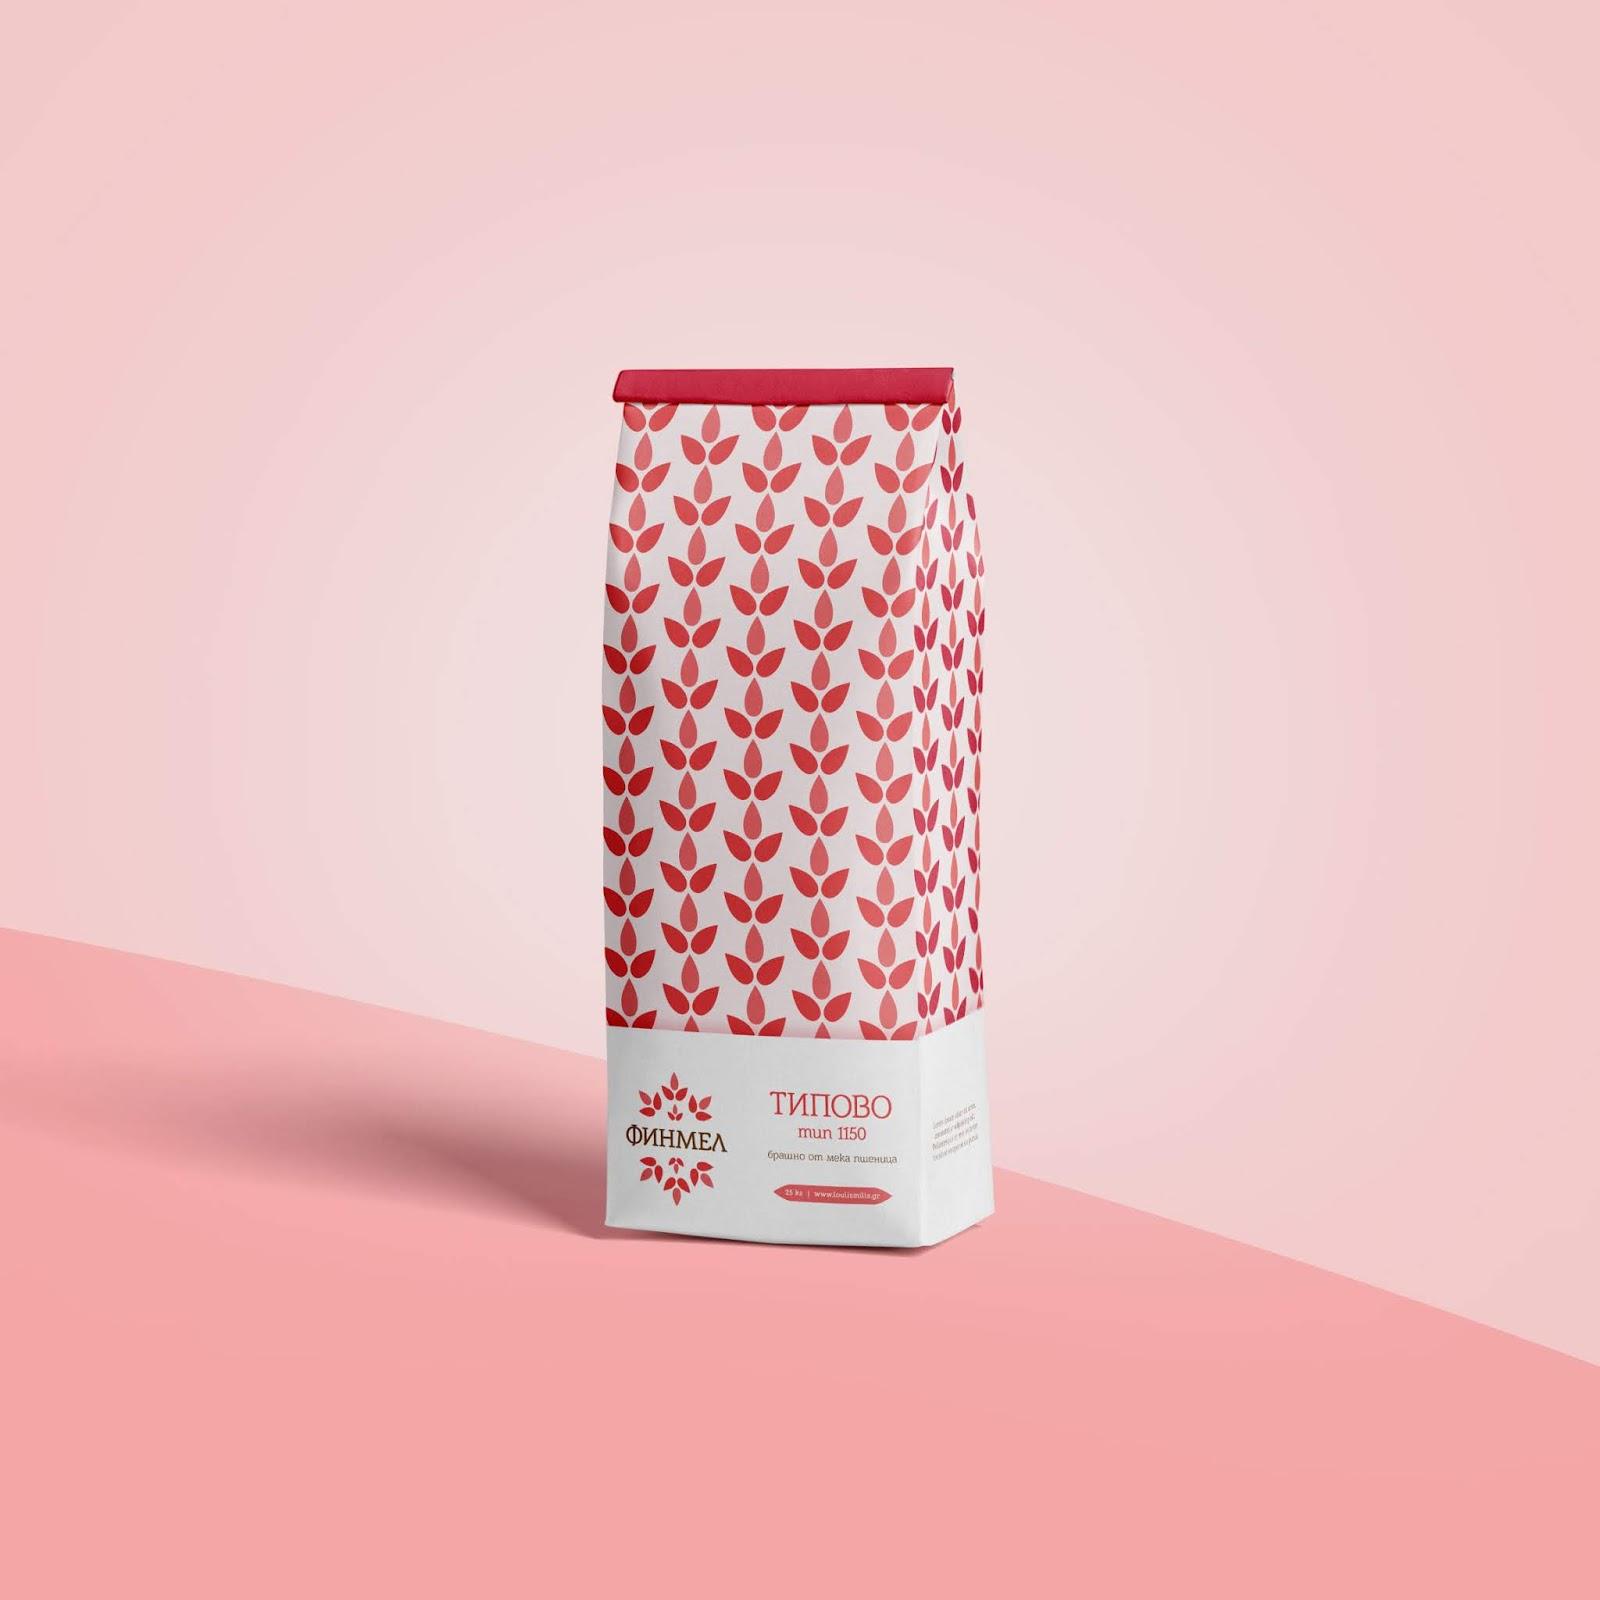 Finmel面粉概念包装设计